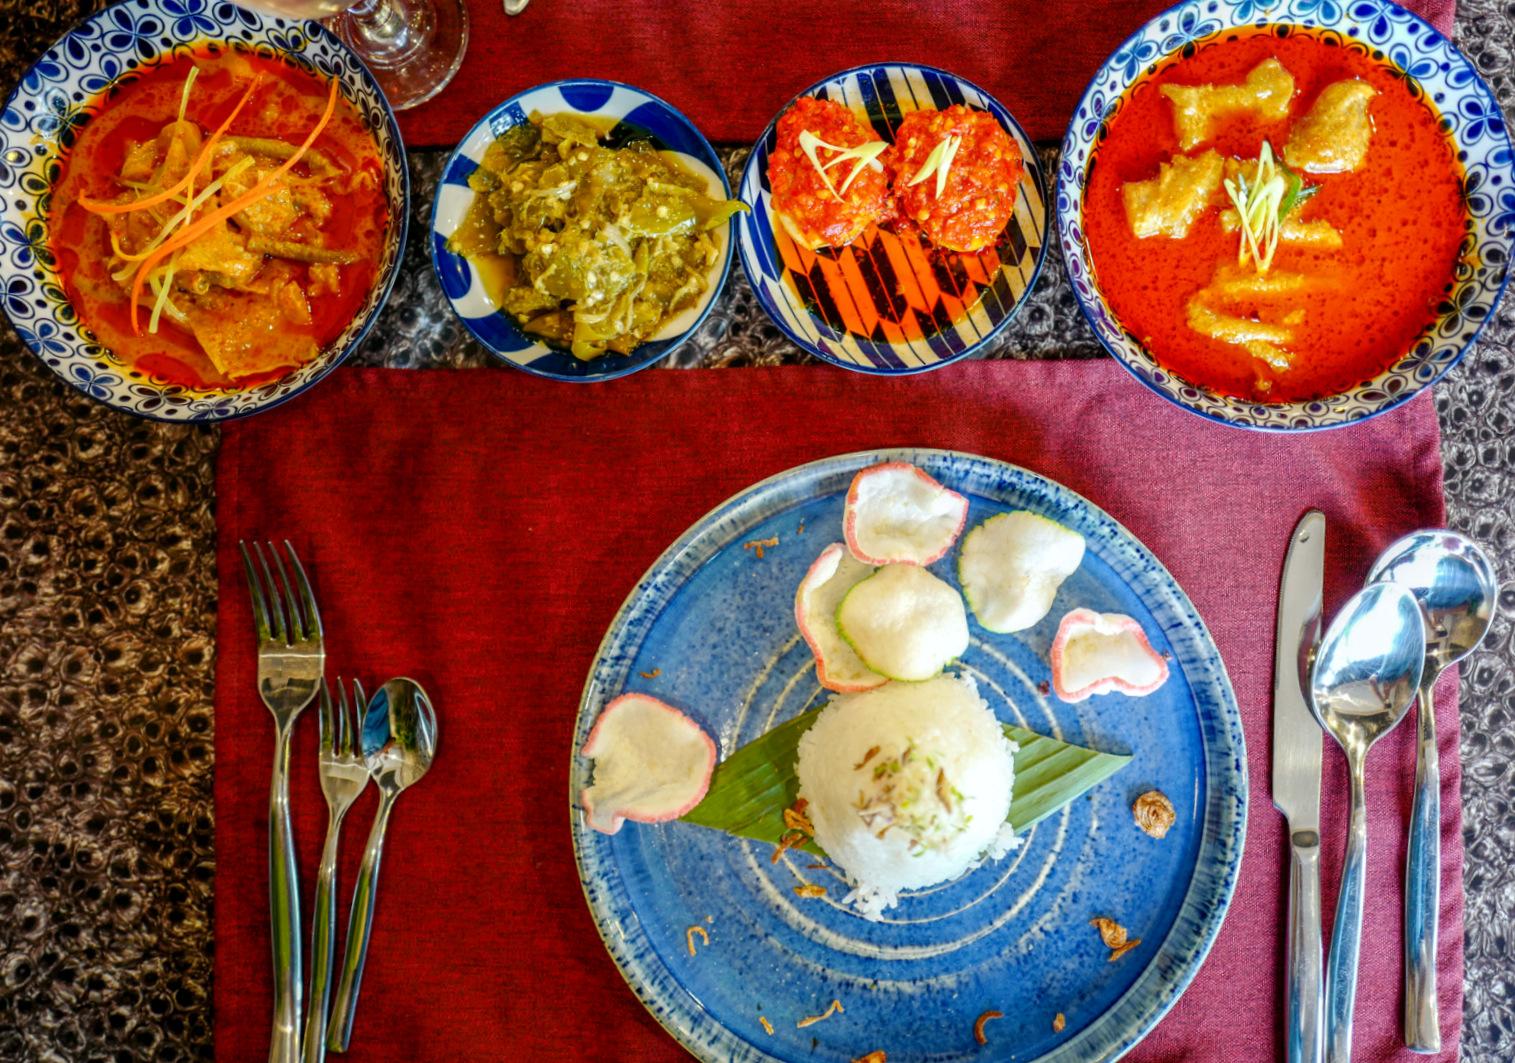 natrabu minang restaurant @ bangsar